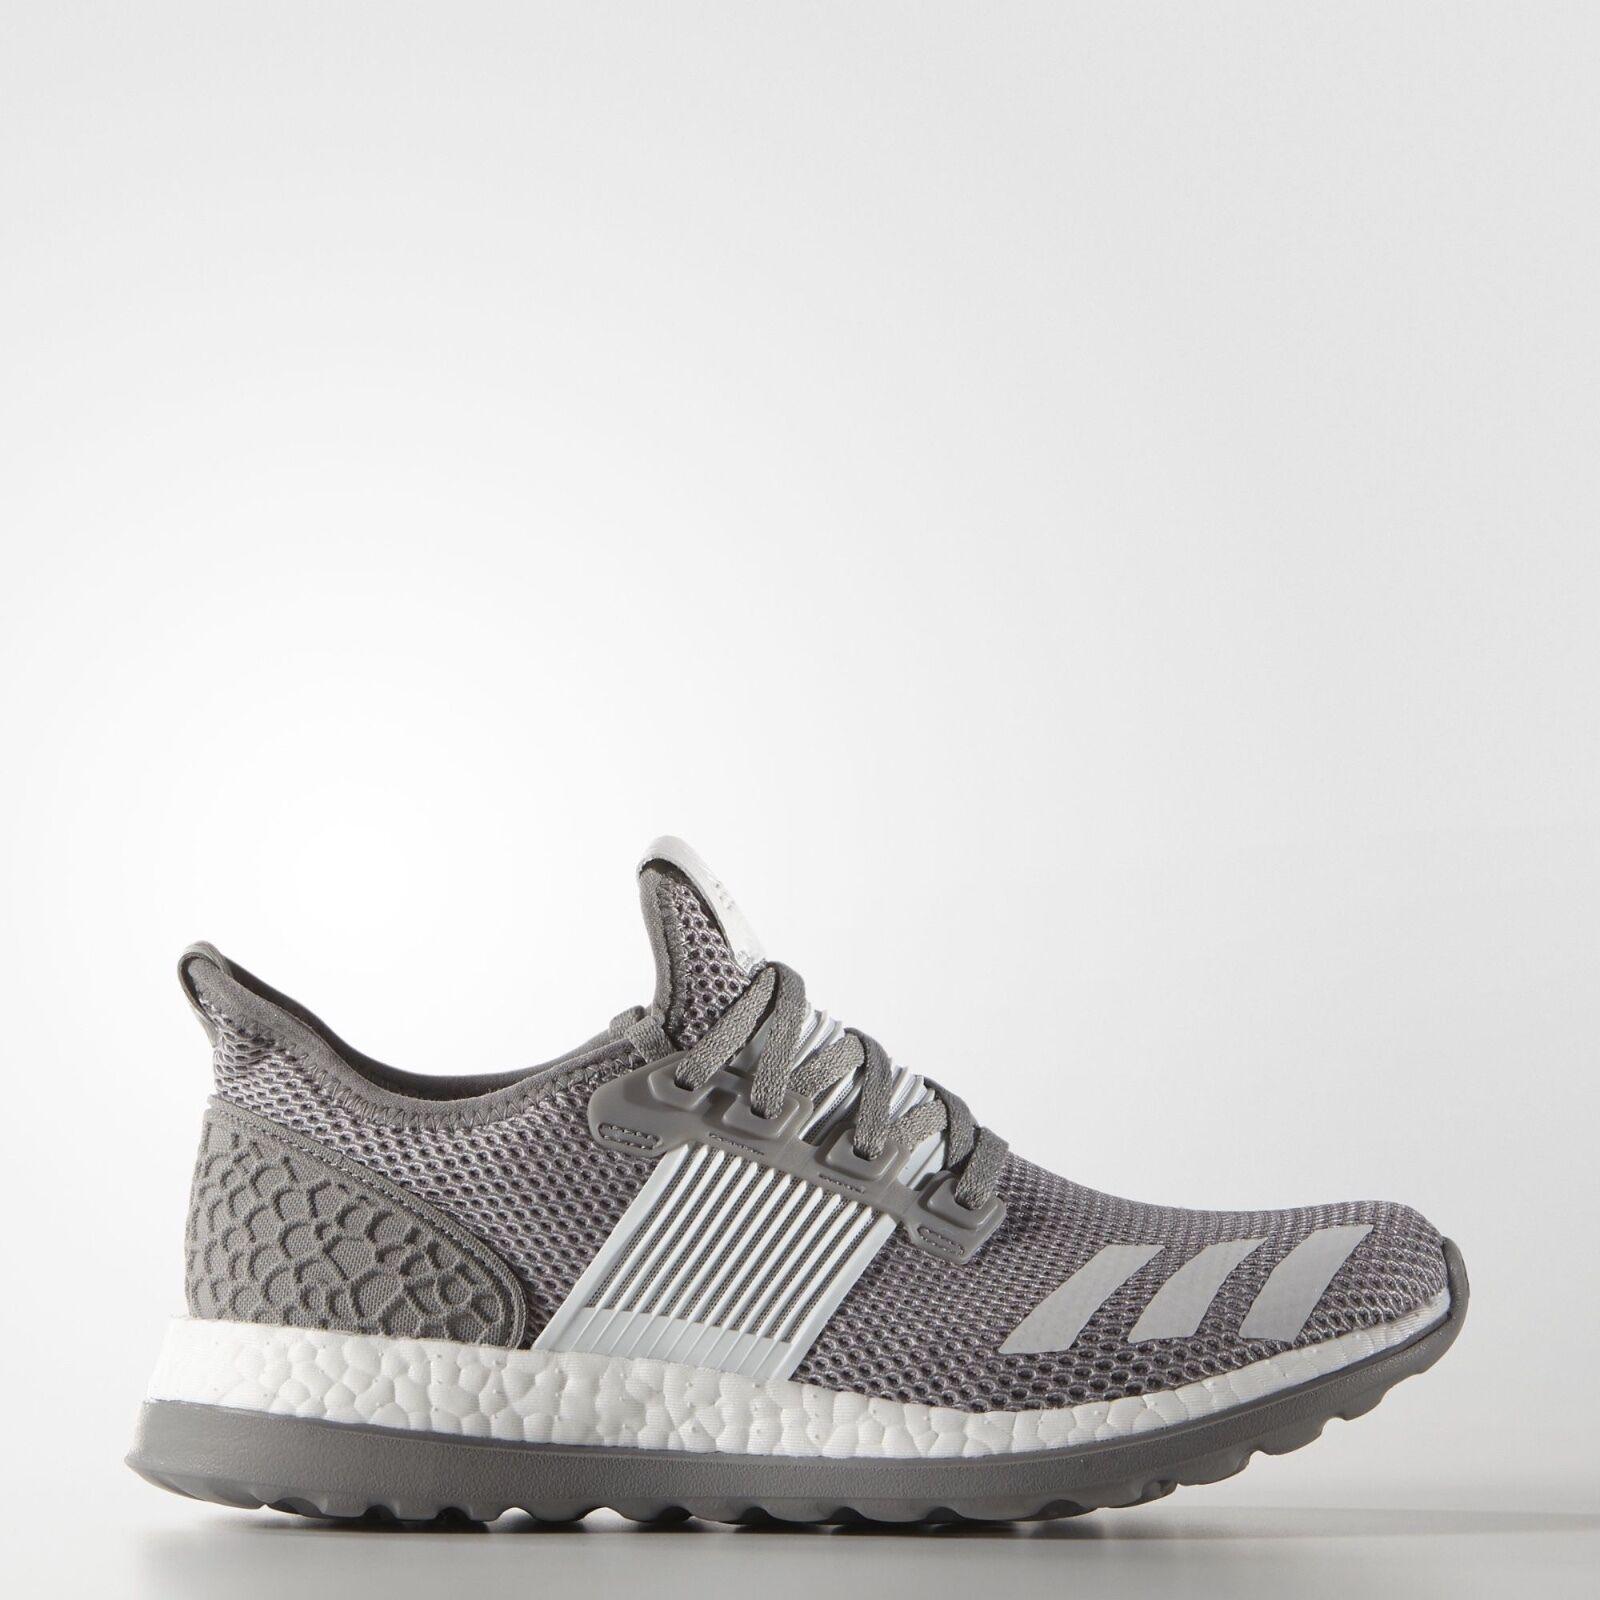 7cb5b12ebc0ec ... adidas pure boost zg mesh men sneakers grey boost gray running shoes  light gray man 6ec06 6fe55  shopping picture 1 of 5 d0853 69f77